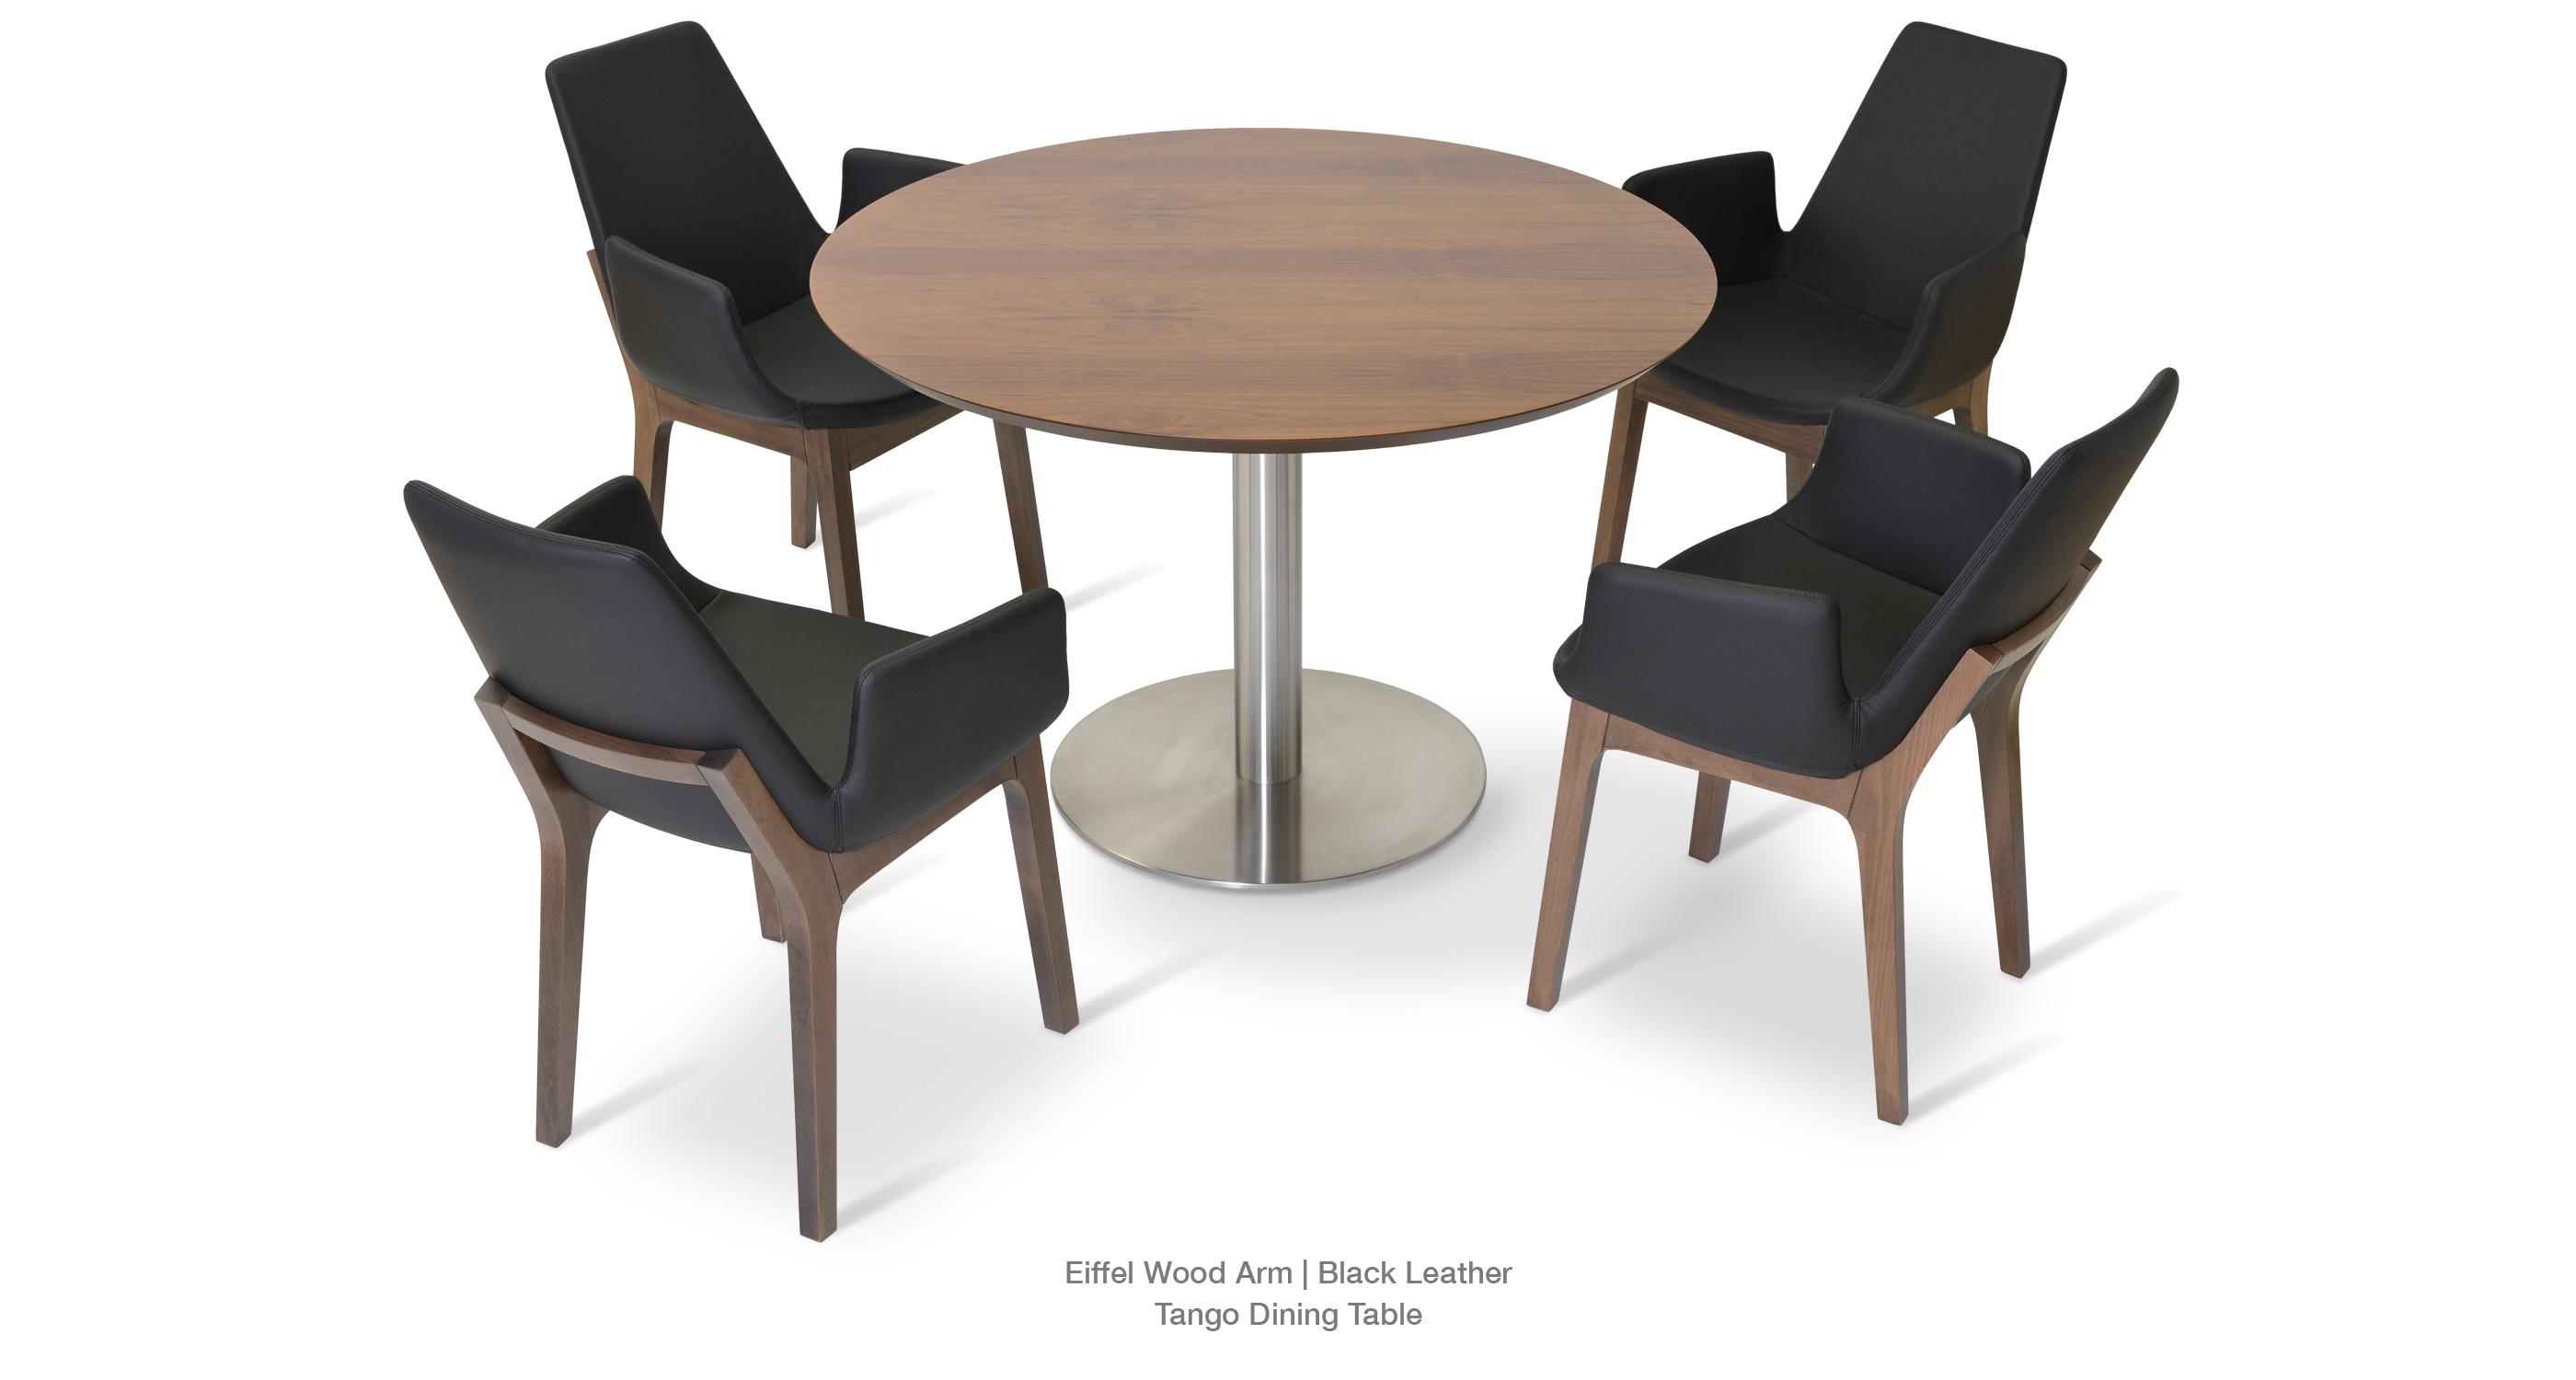 Awesome Eiffel Arm Wood Hotel Wood Arm Chair Sohoconcept Dailytribune Chair Design For Home Dailytribuneorg